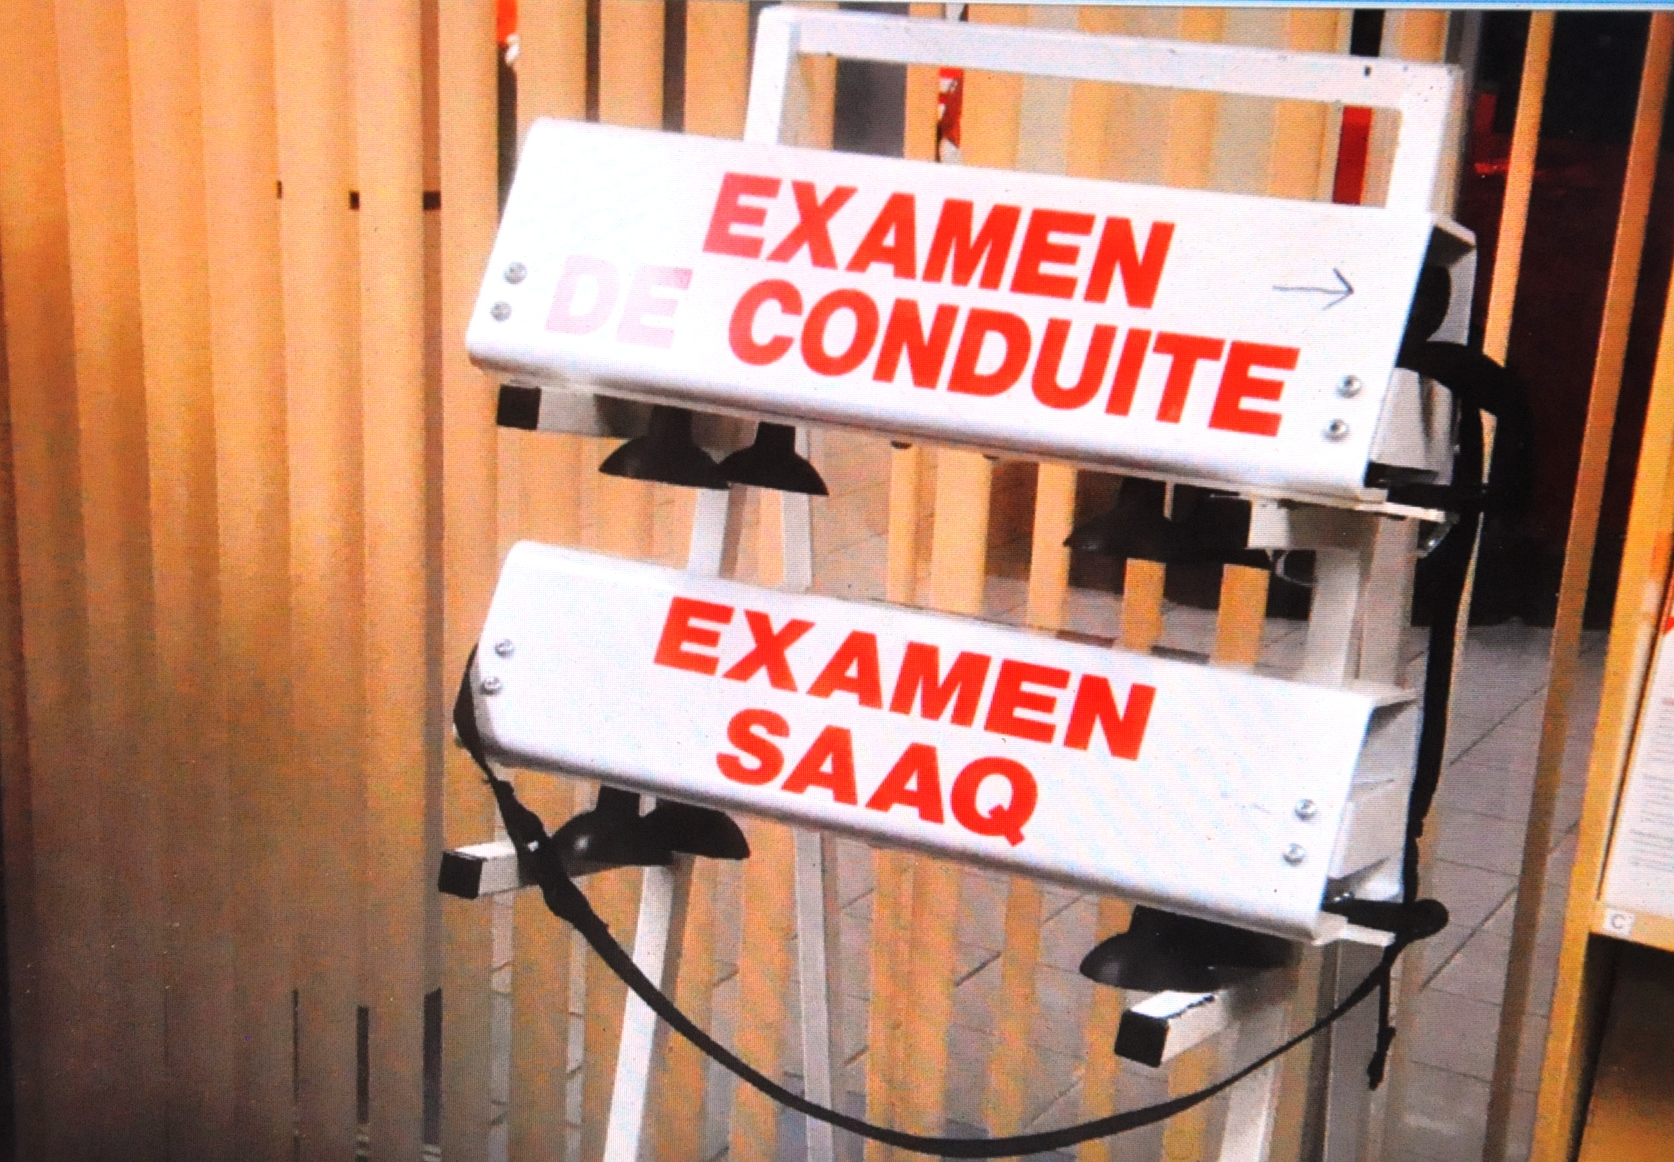 Examen conduite